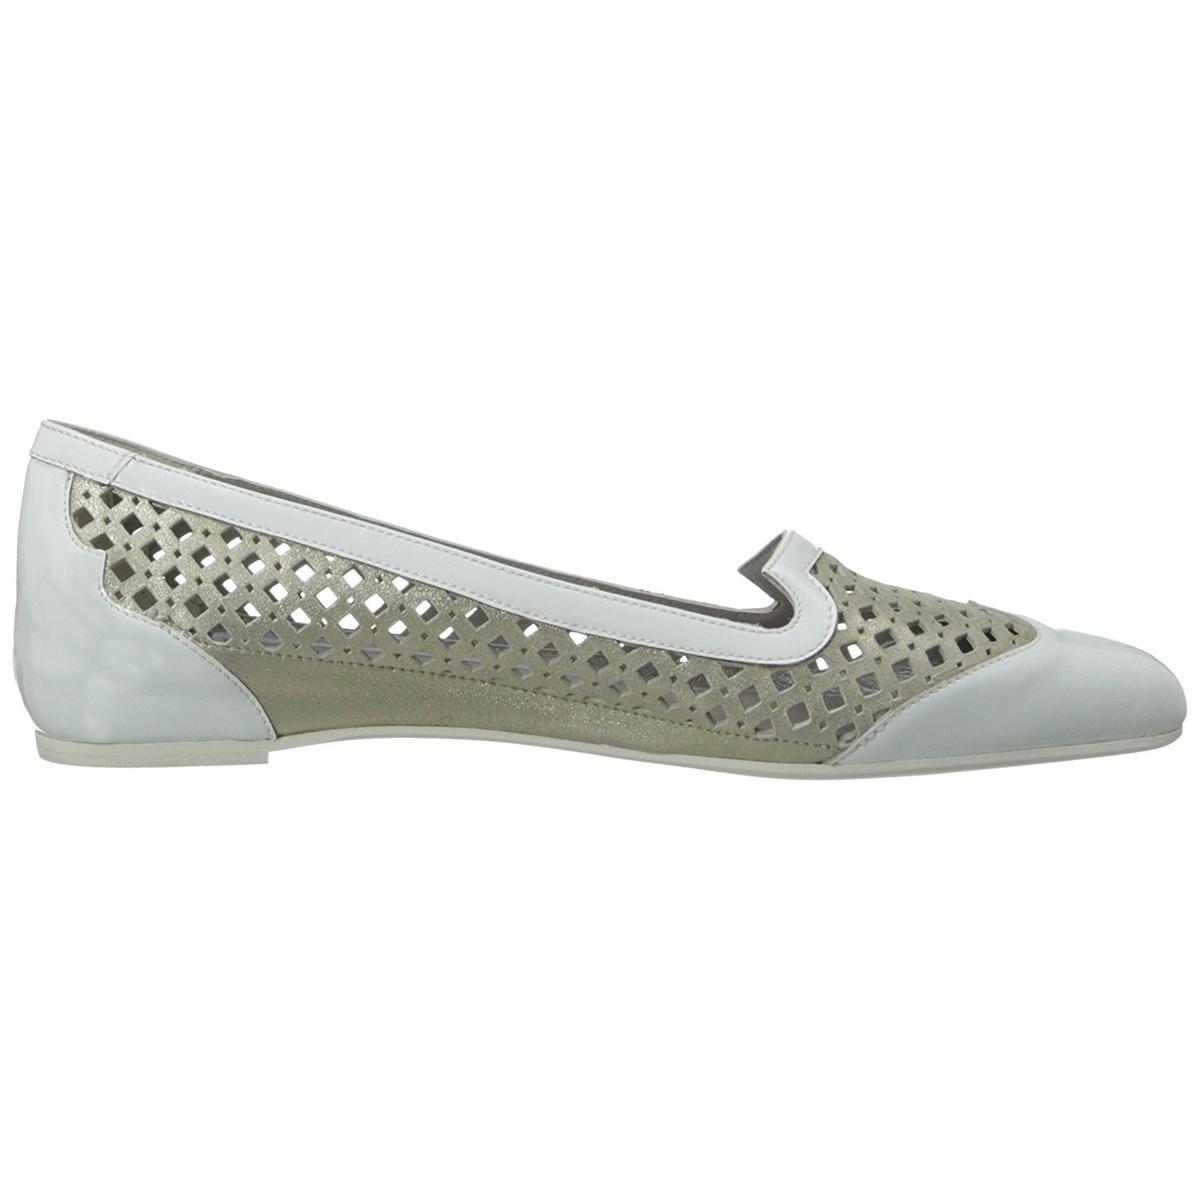 Aquatalia Women's Yvanka White Combo 6.5M Flats 6.5M Combo b4acb9